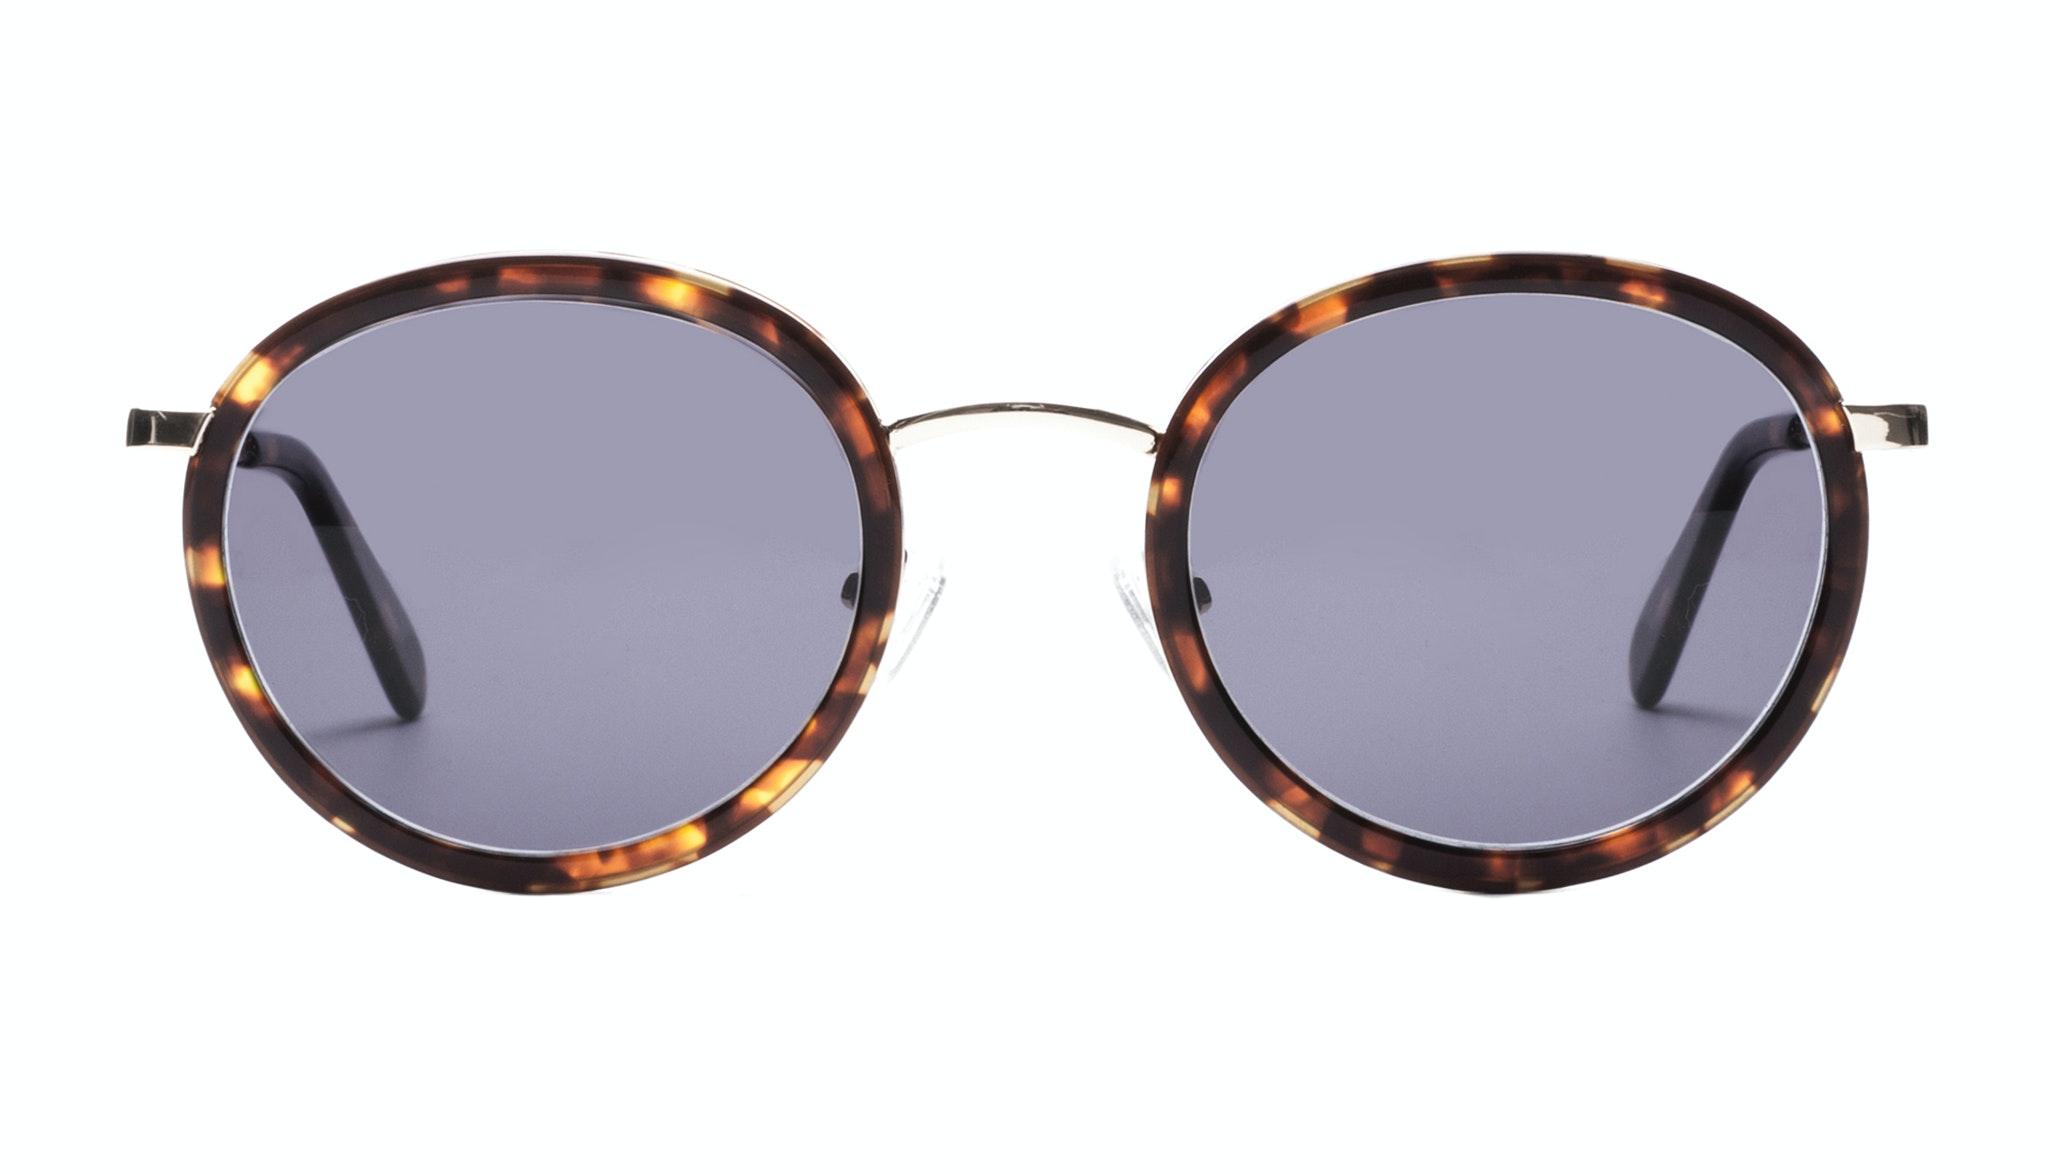 Affordable Fashion Glasses Round Sunglasses Women Strike Gold Sepia